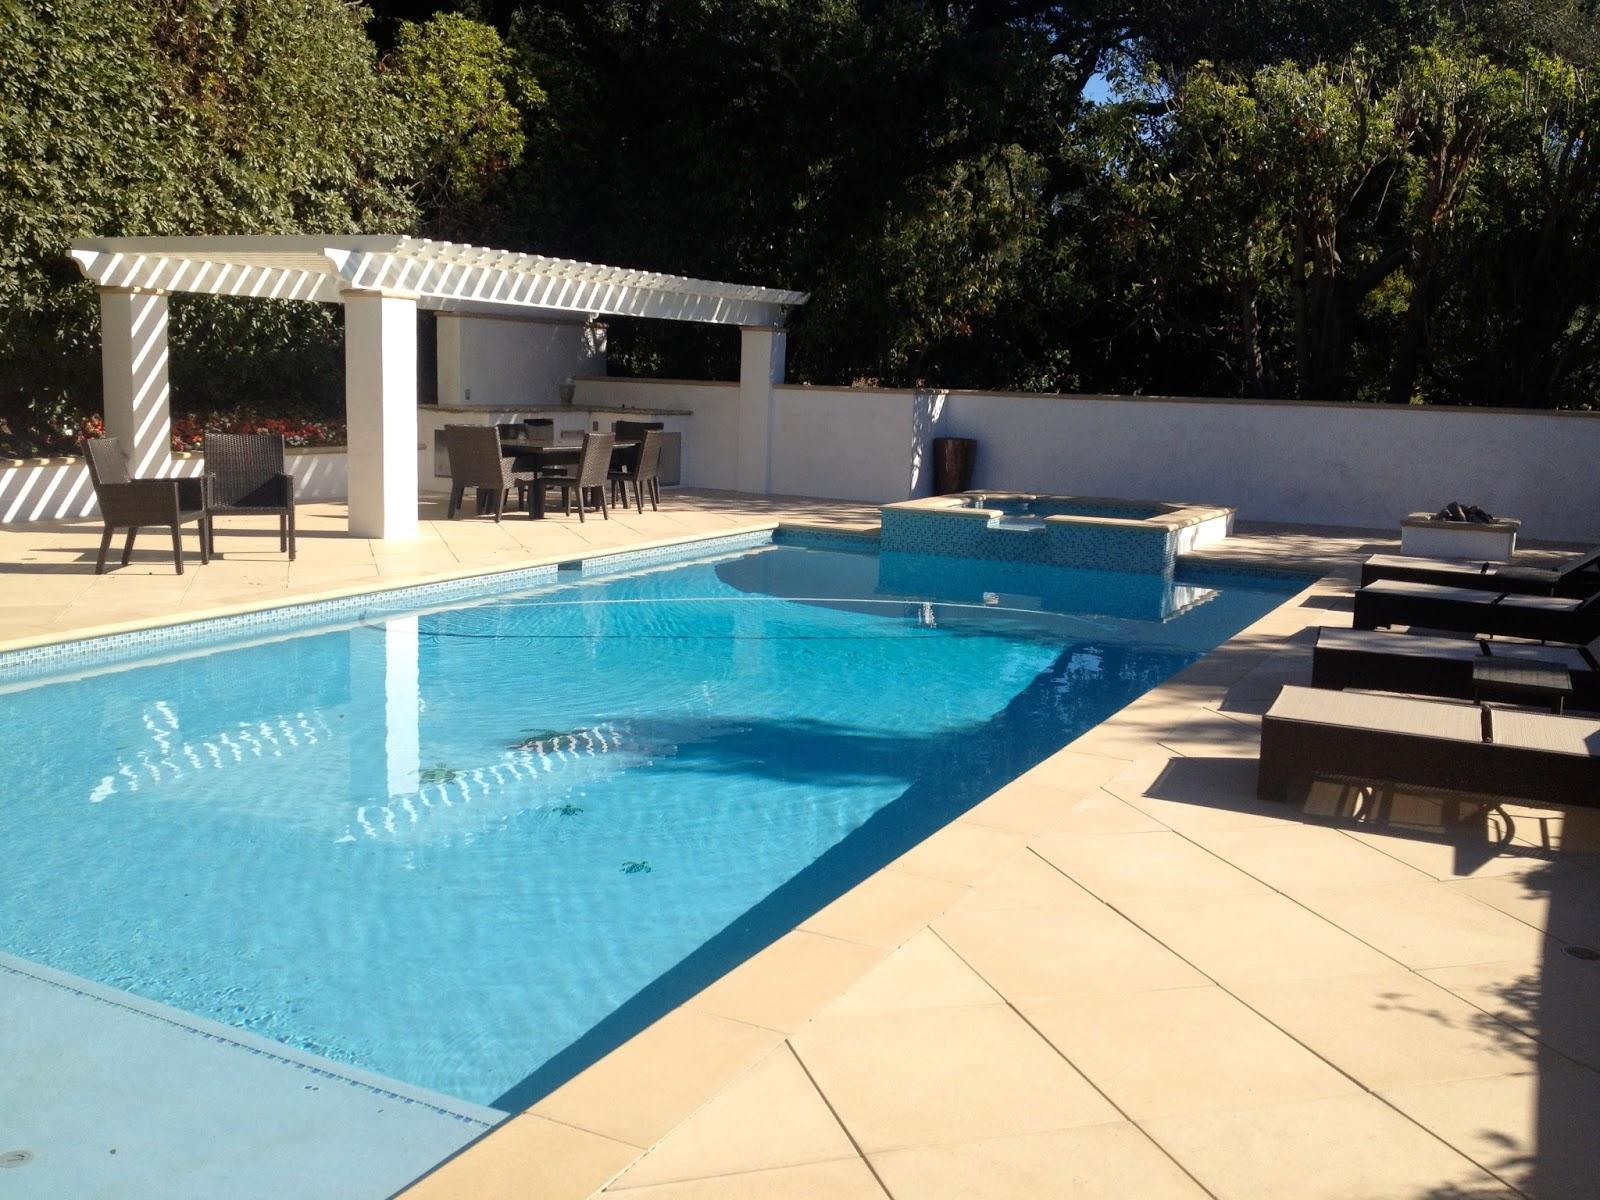 Pool House Bar